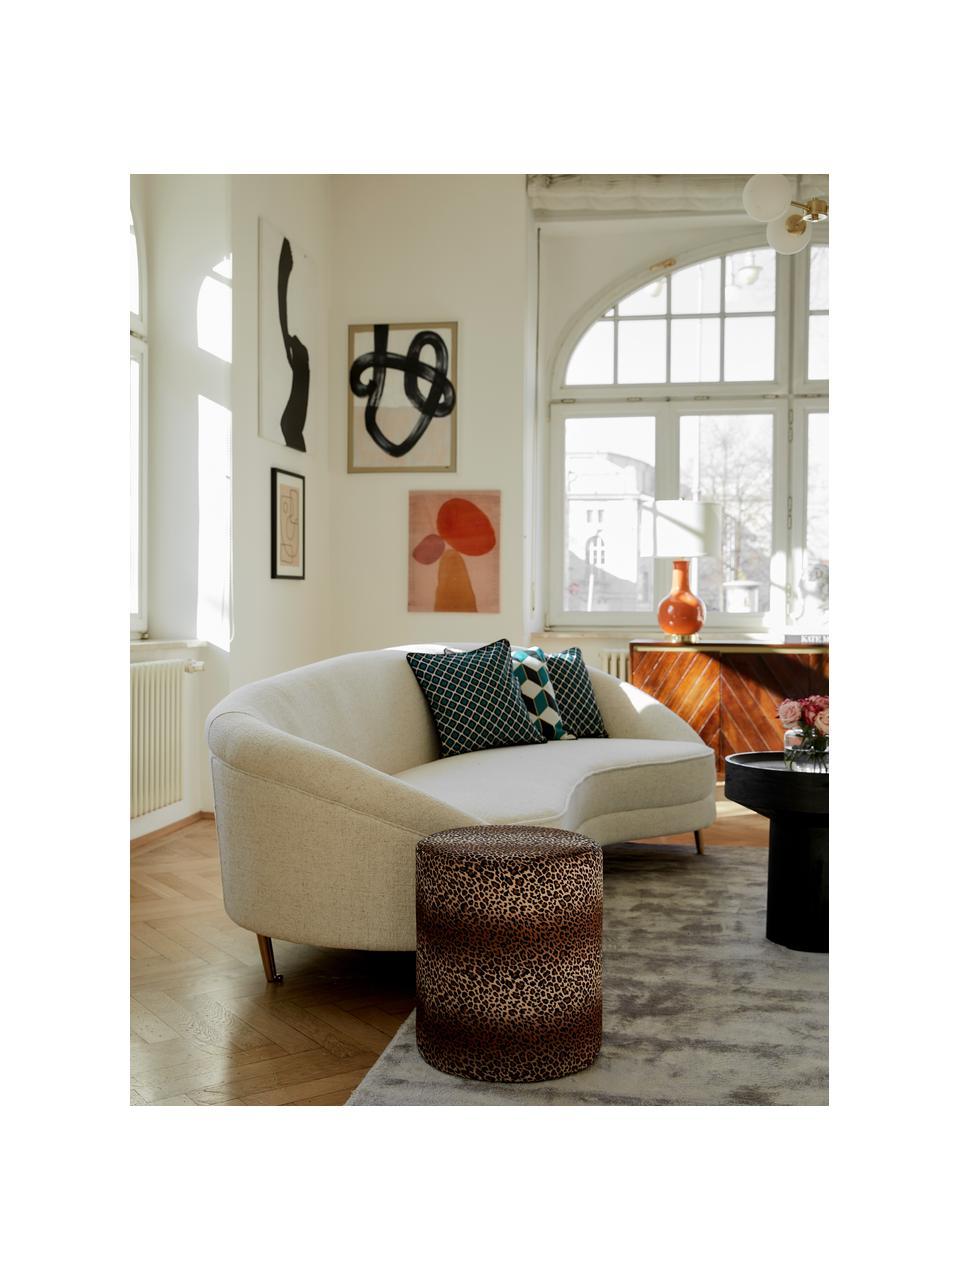 Fluwelen poef Daisy met luipaard patroon, Bekleding: fluweel (polyester), Frame: multiplex, Bruin, Ø 38 x H 45 cm